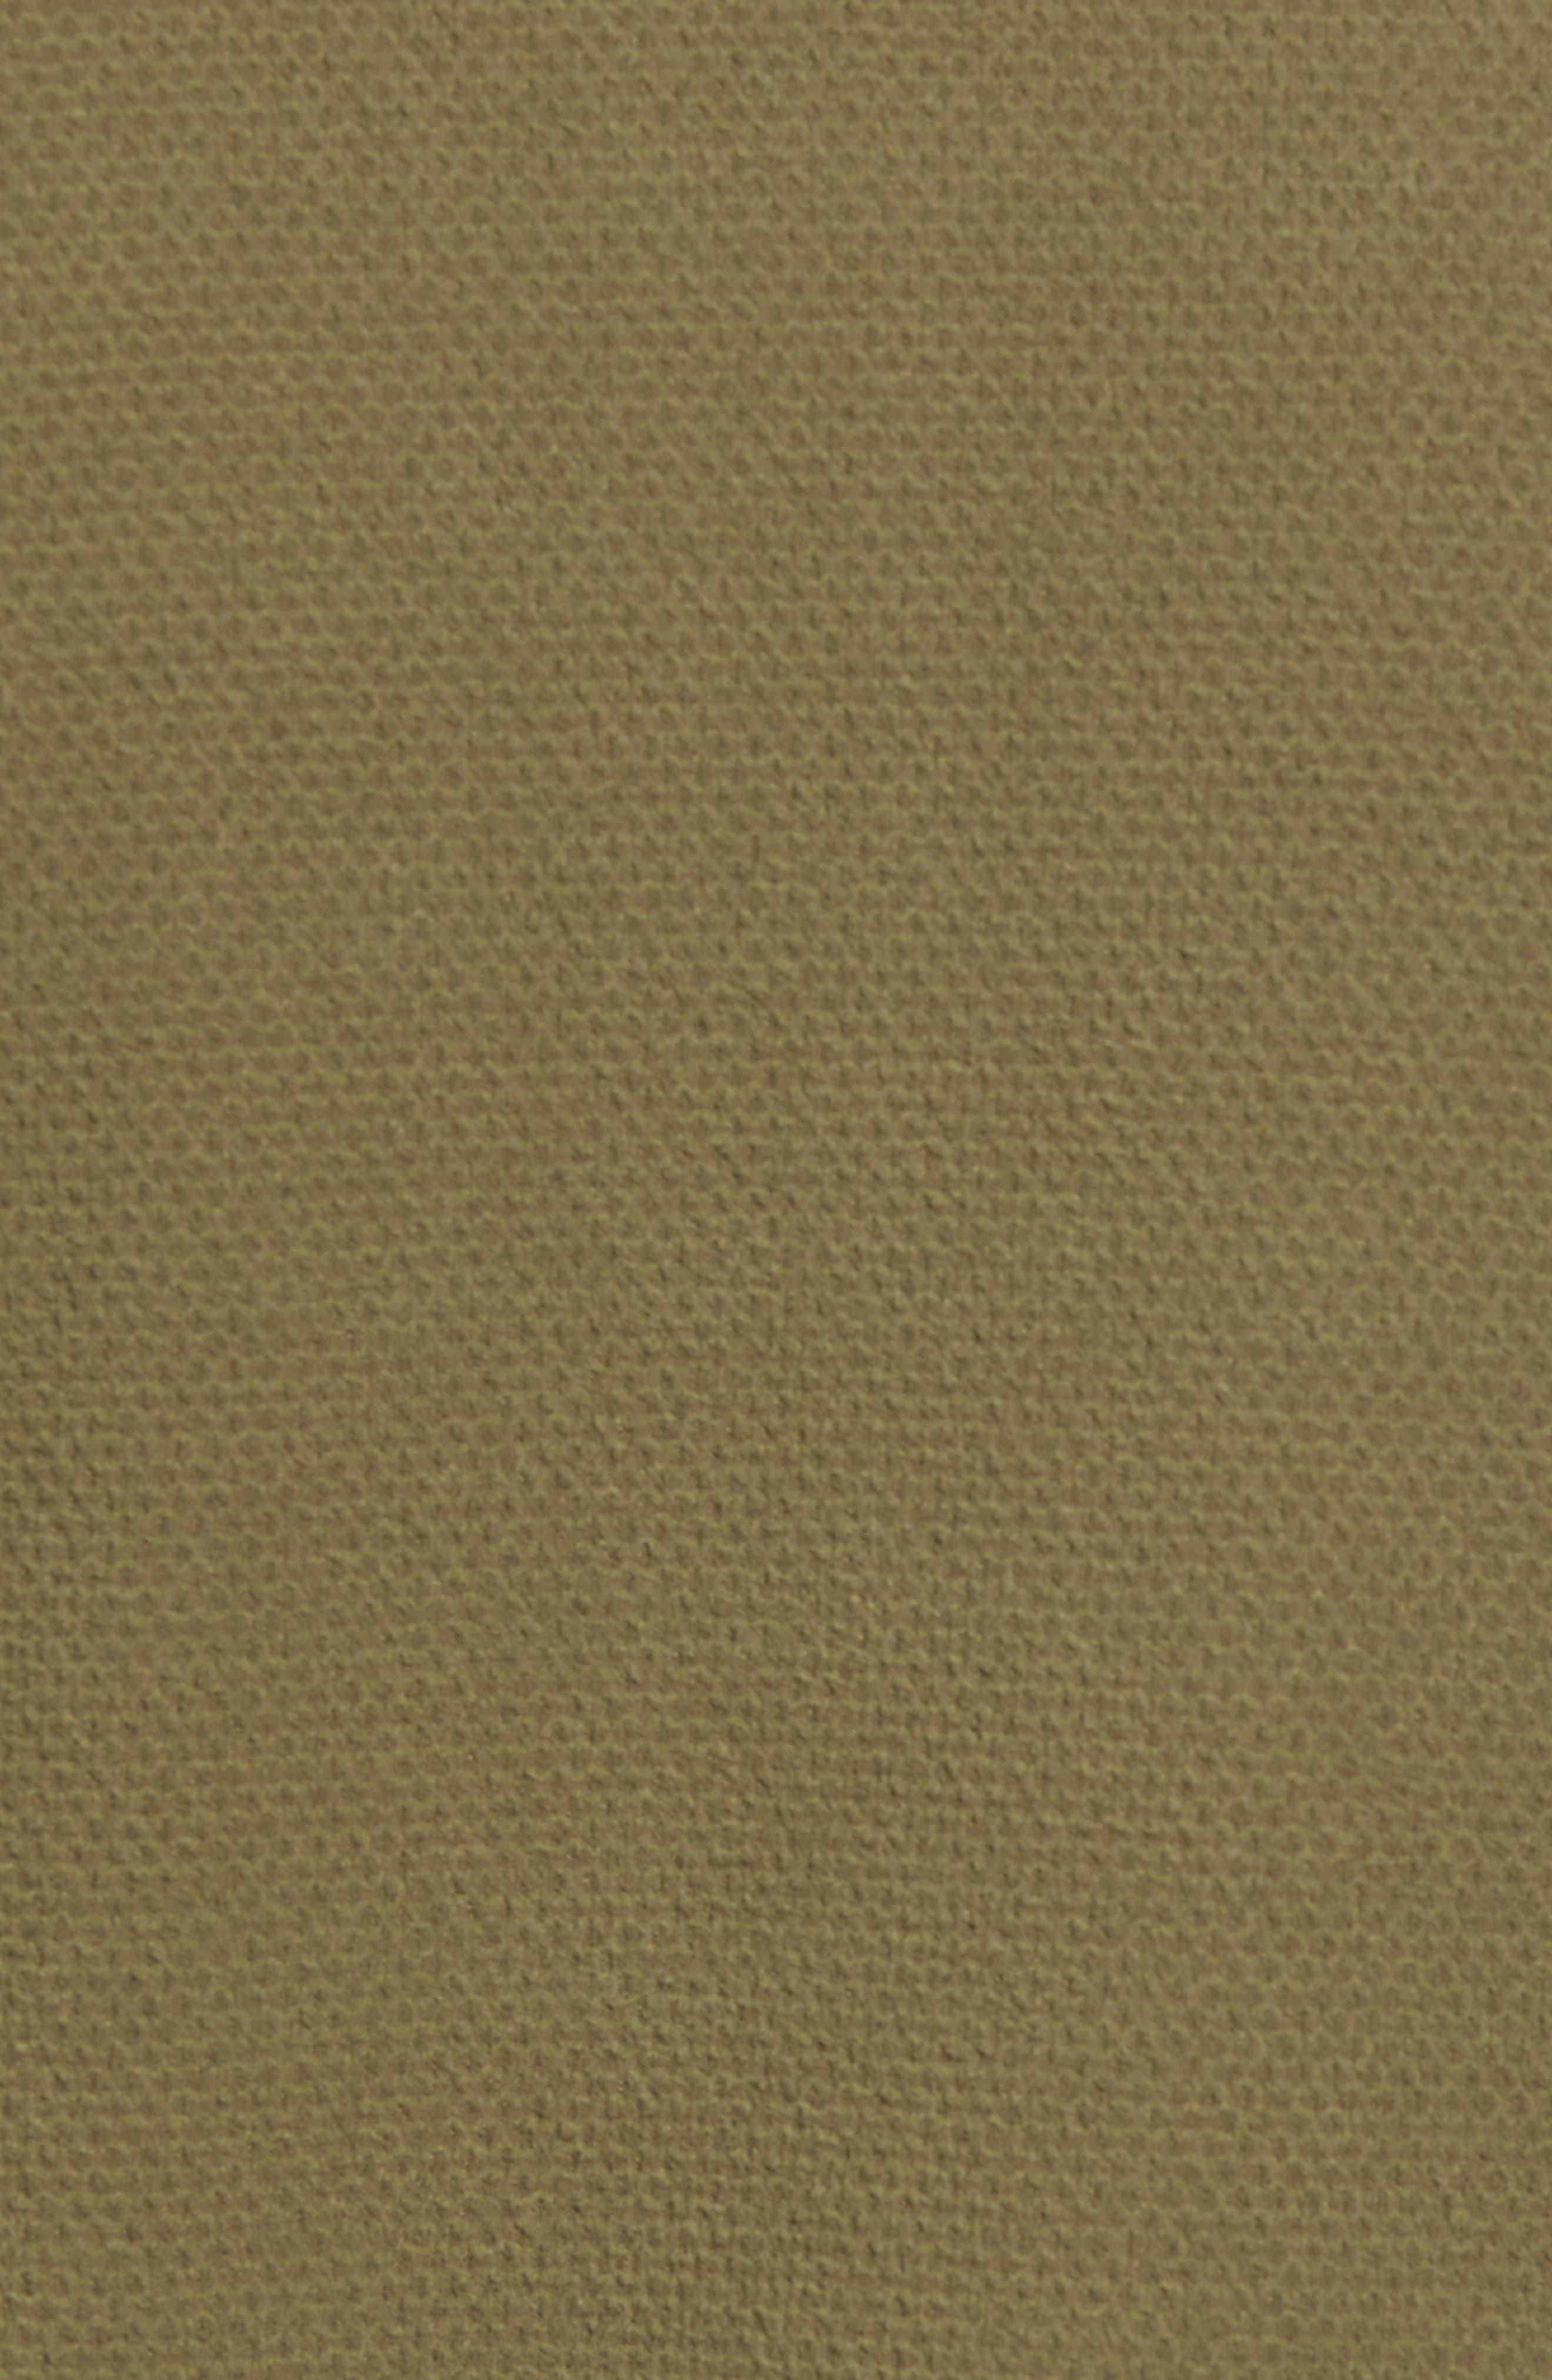 Alternate Image 5  - The North Face Cap Rock Fleece Jacket